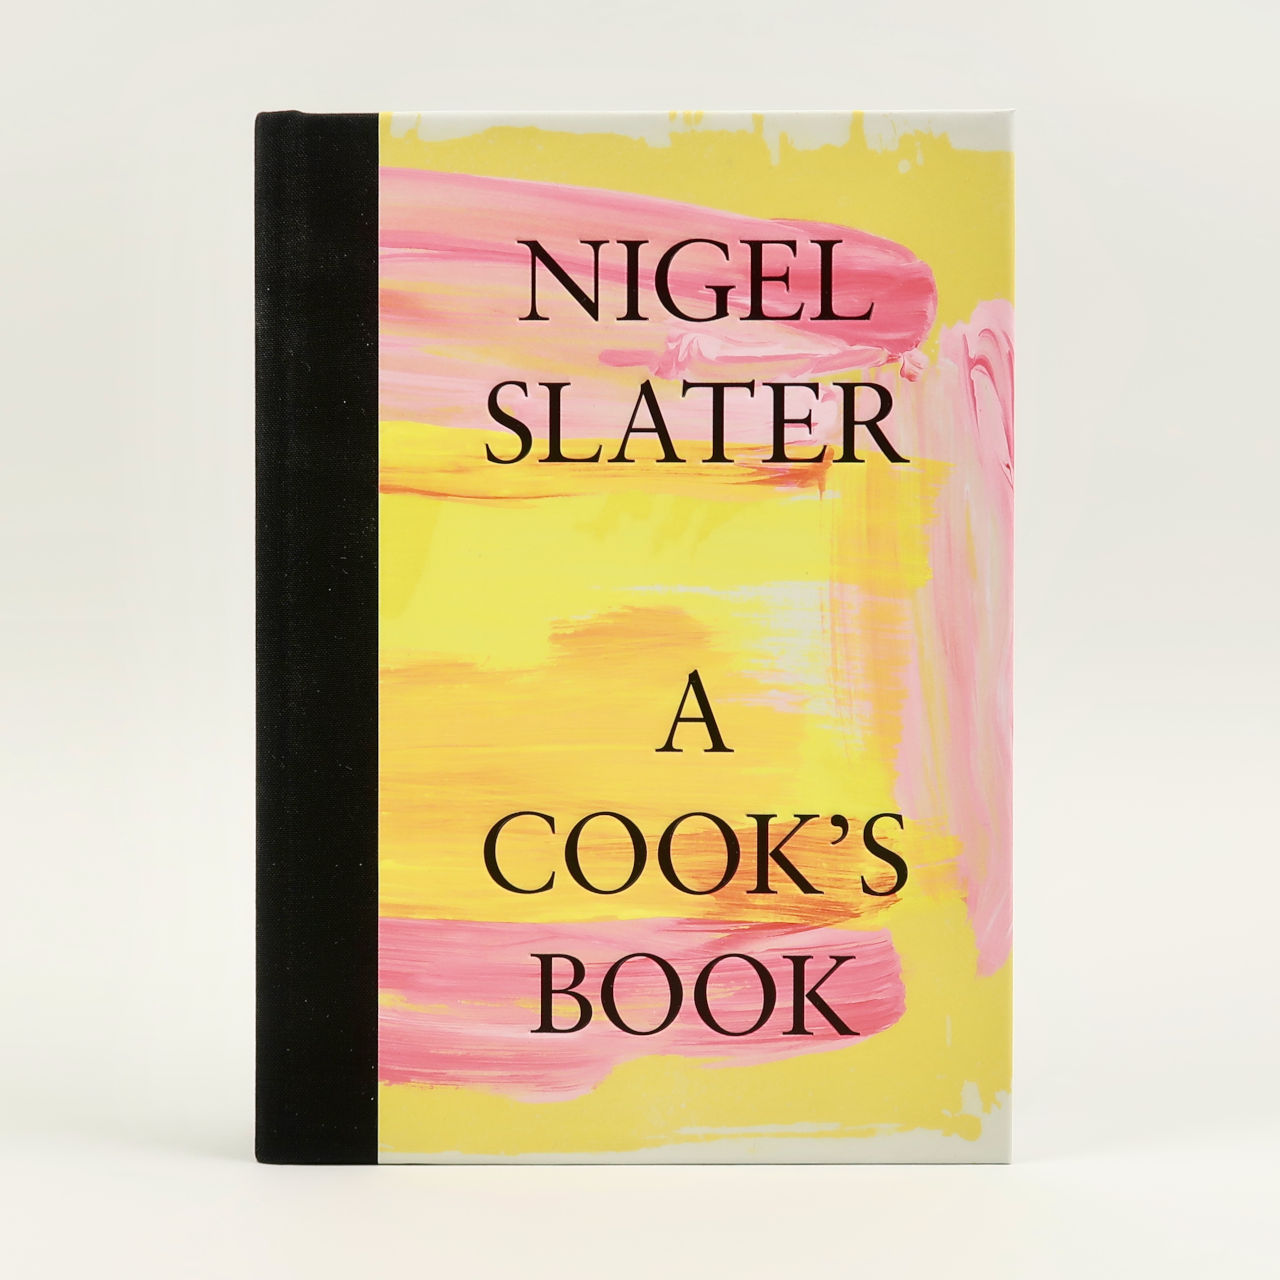 nigel slater a cooks book